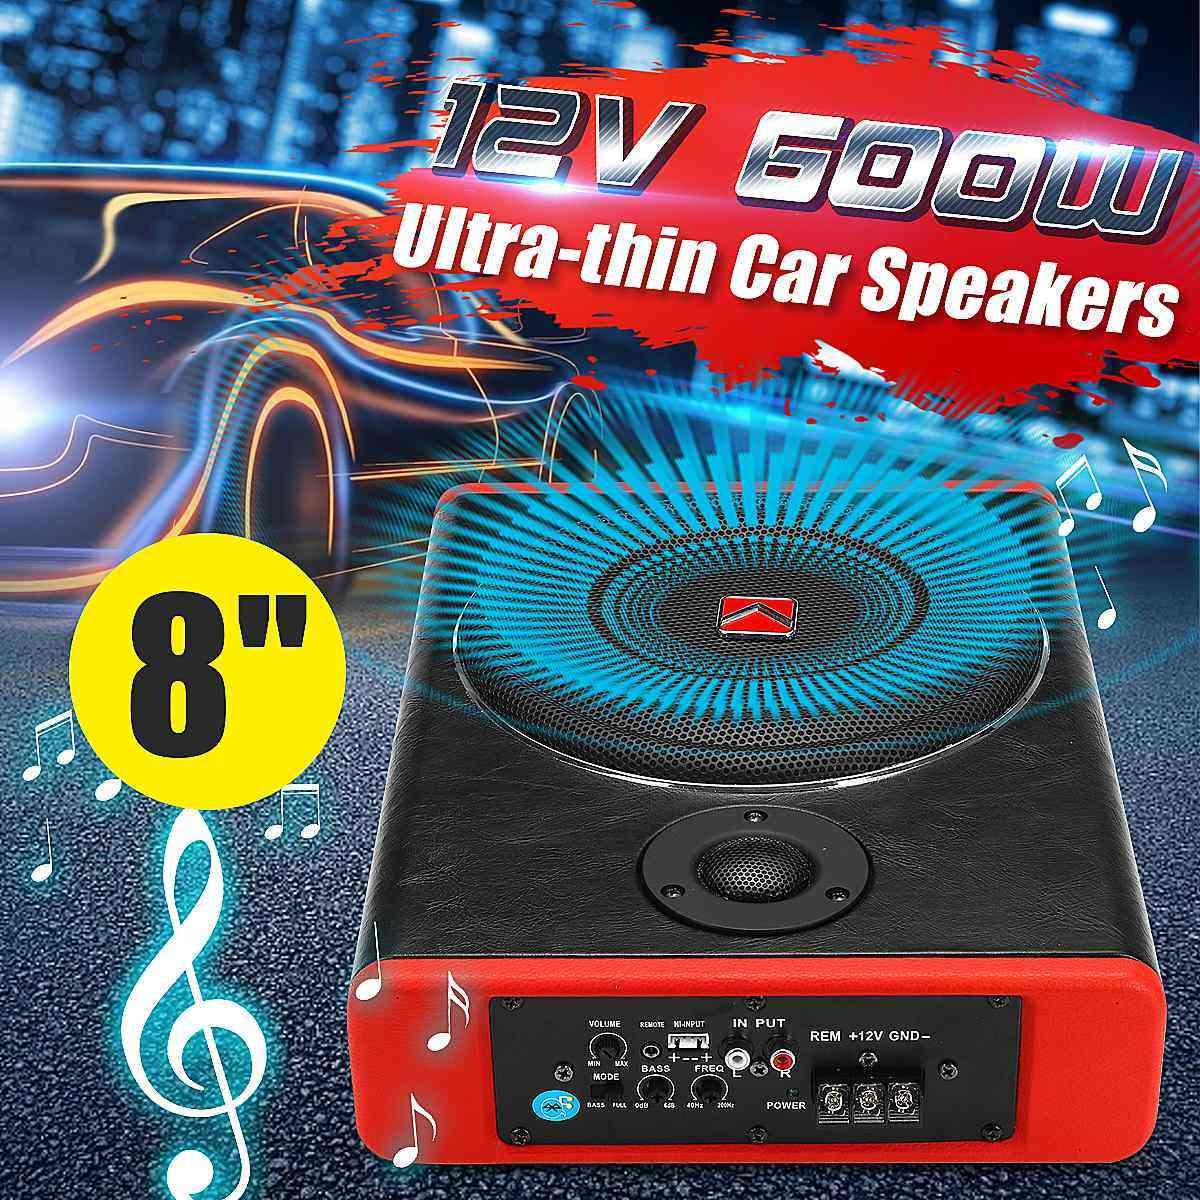 Speaker / Audio Amplifier Vehicle Subwoofer